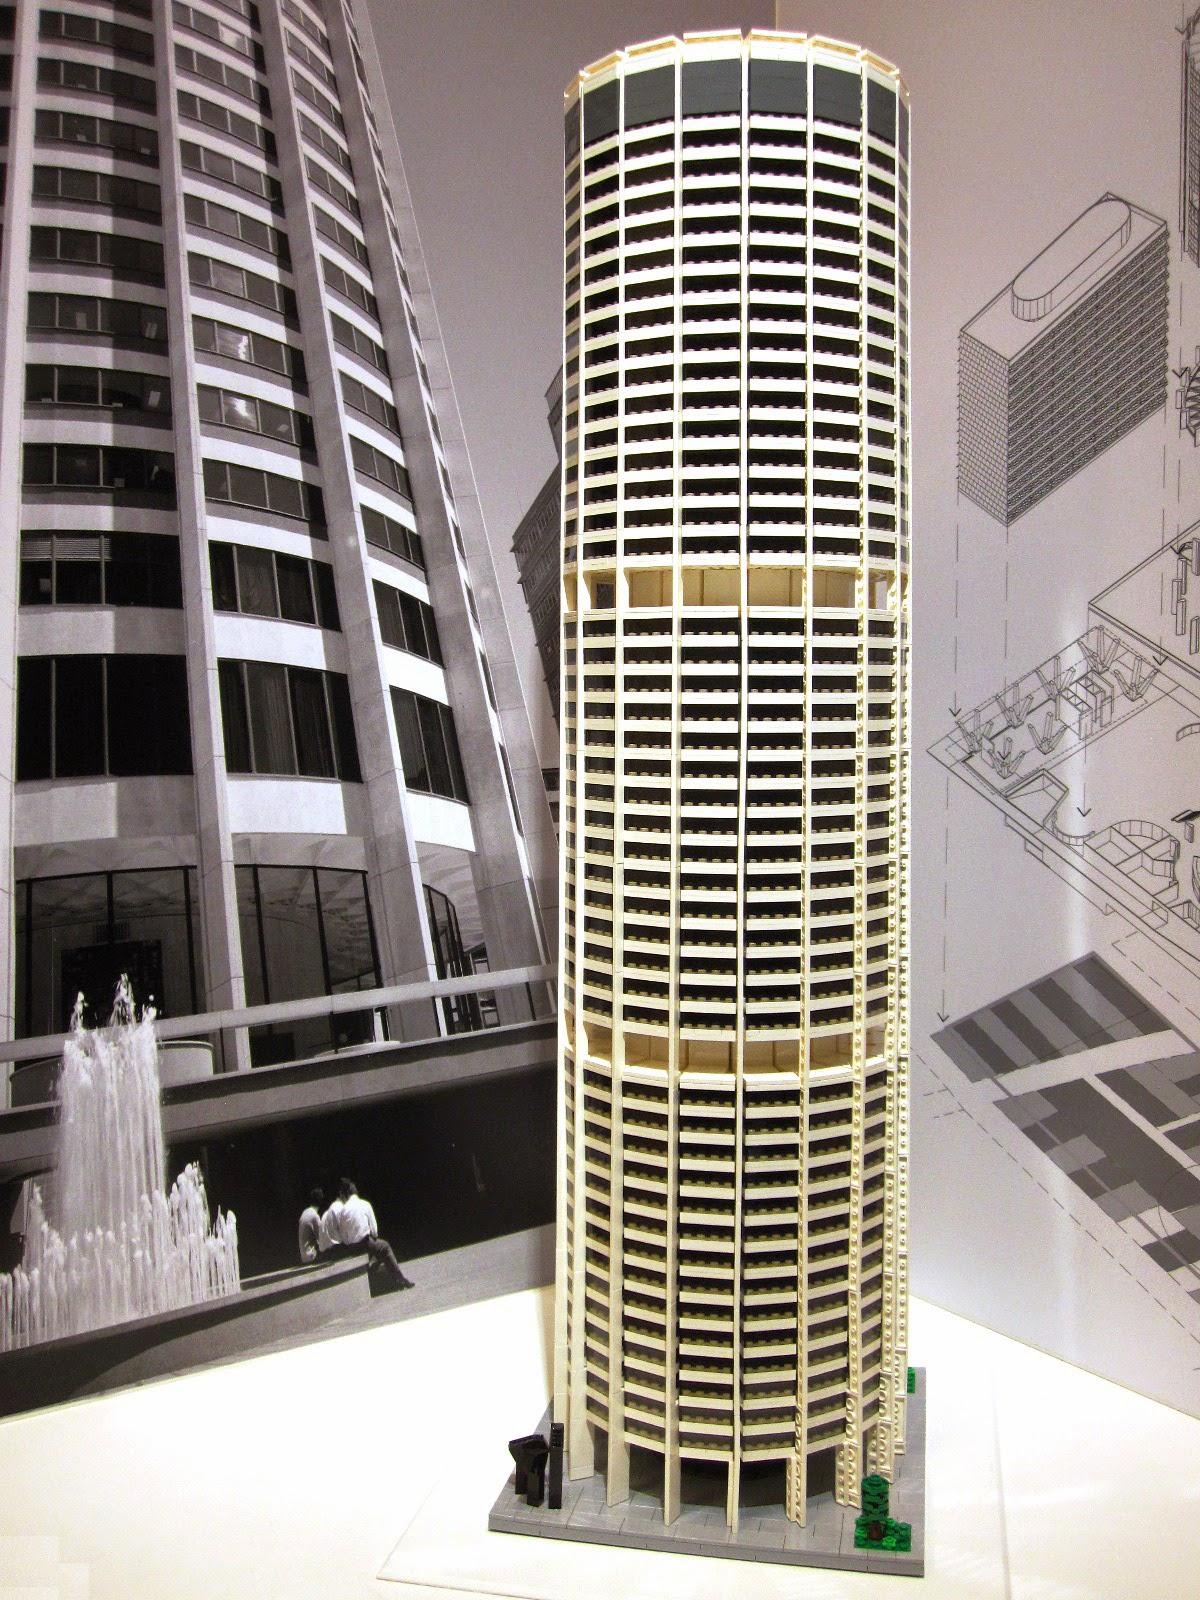 Harry Seidler's Australia Square, made of Lego.